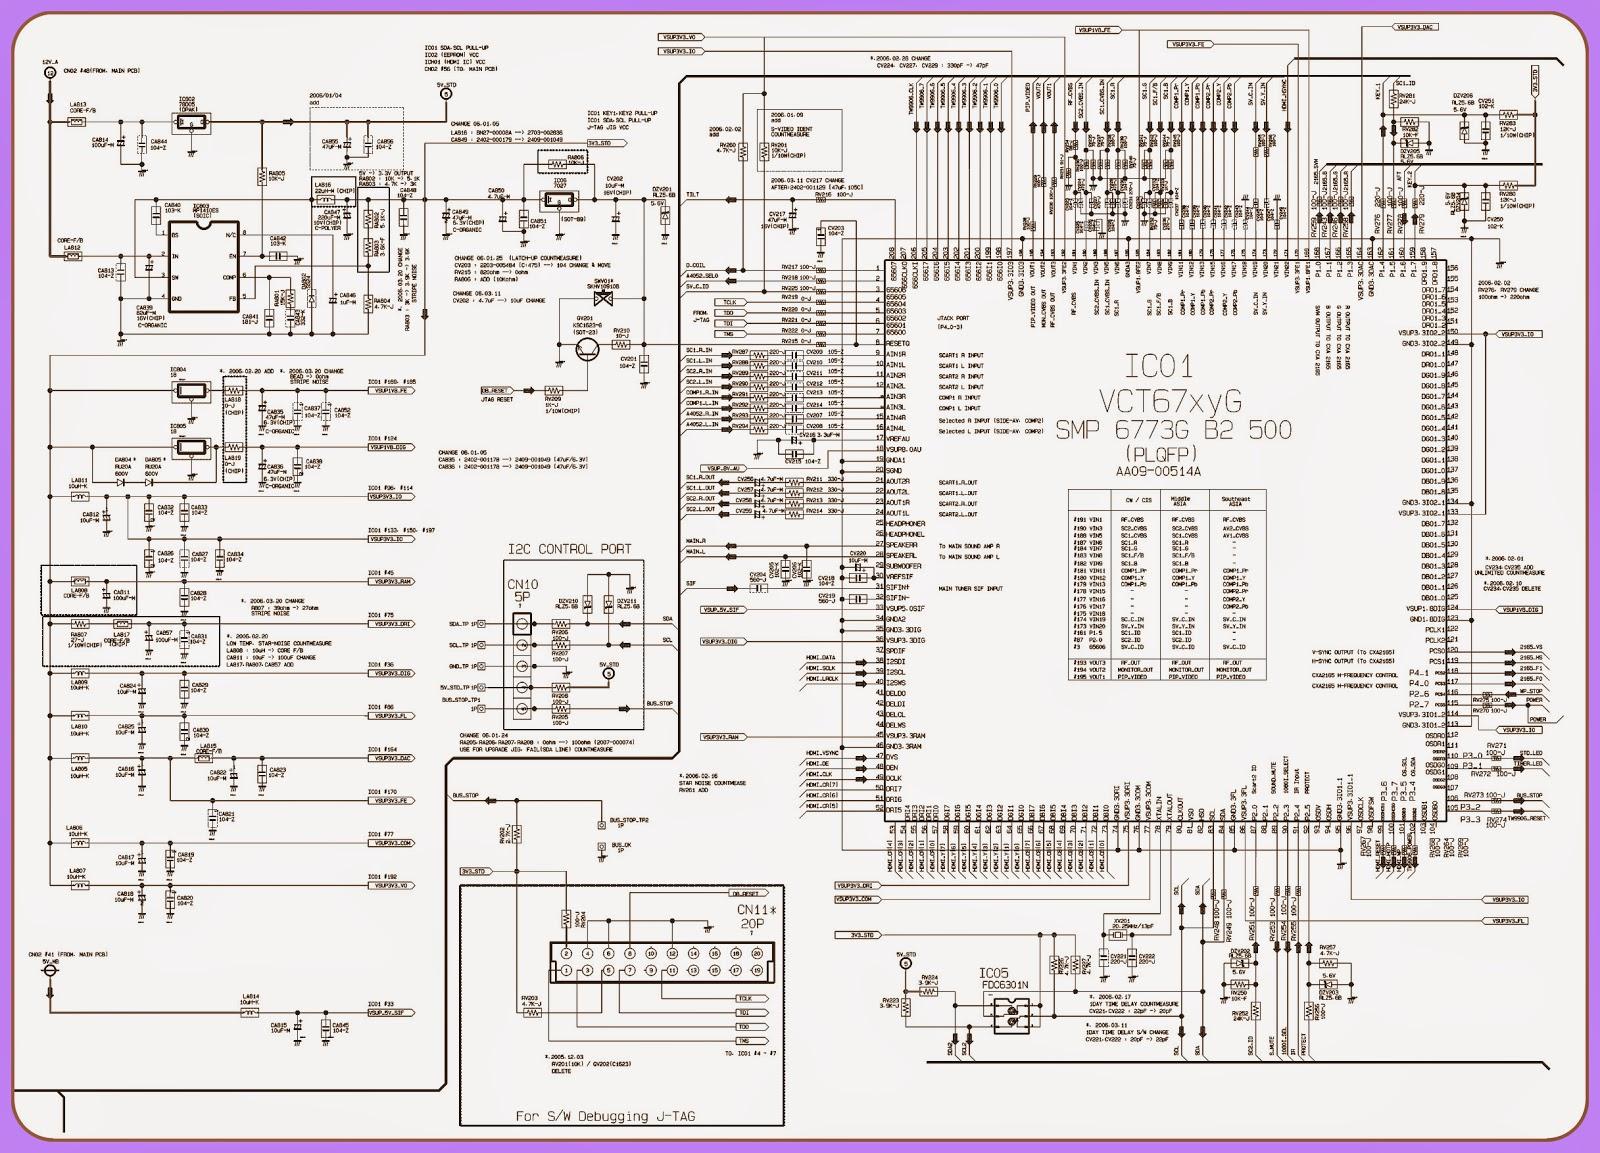 Tv Tuner Card Circuit Diagram Best Software Samsung Schematic Layout Site Wiring Harness